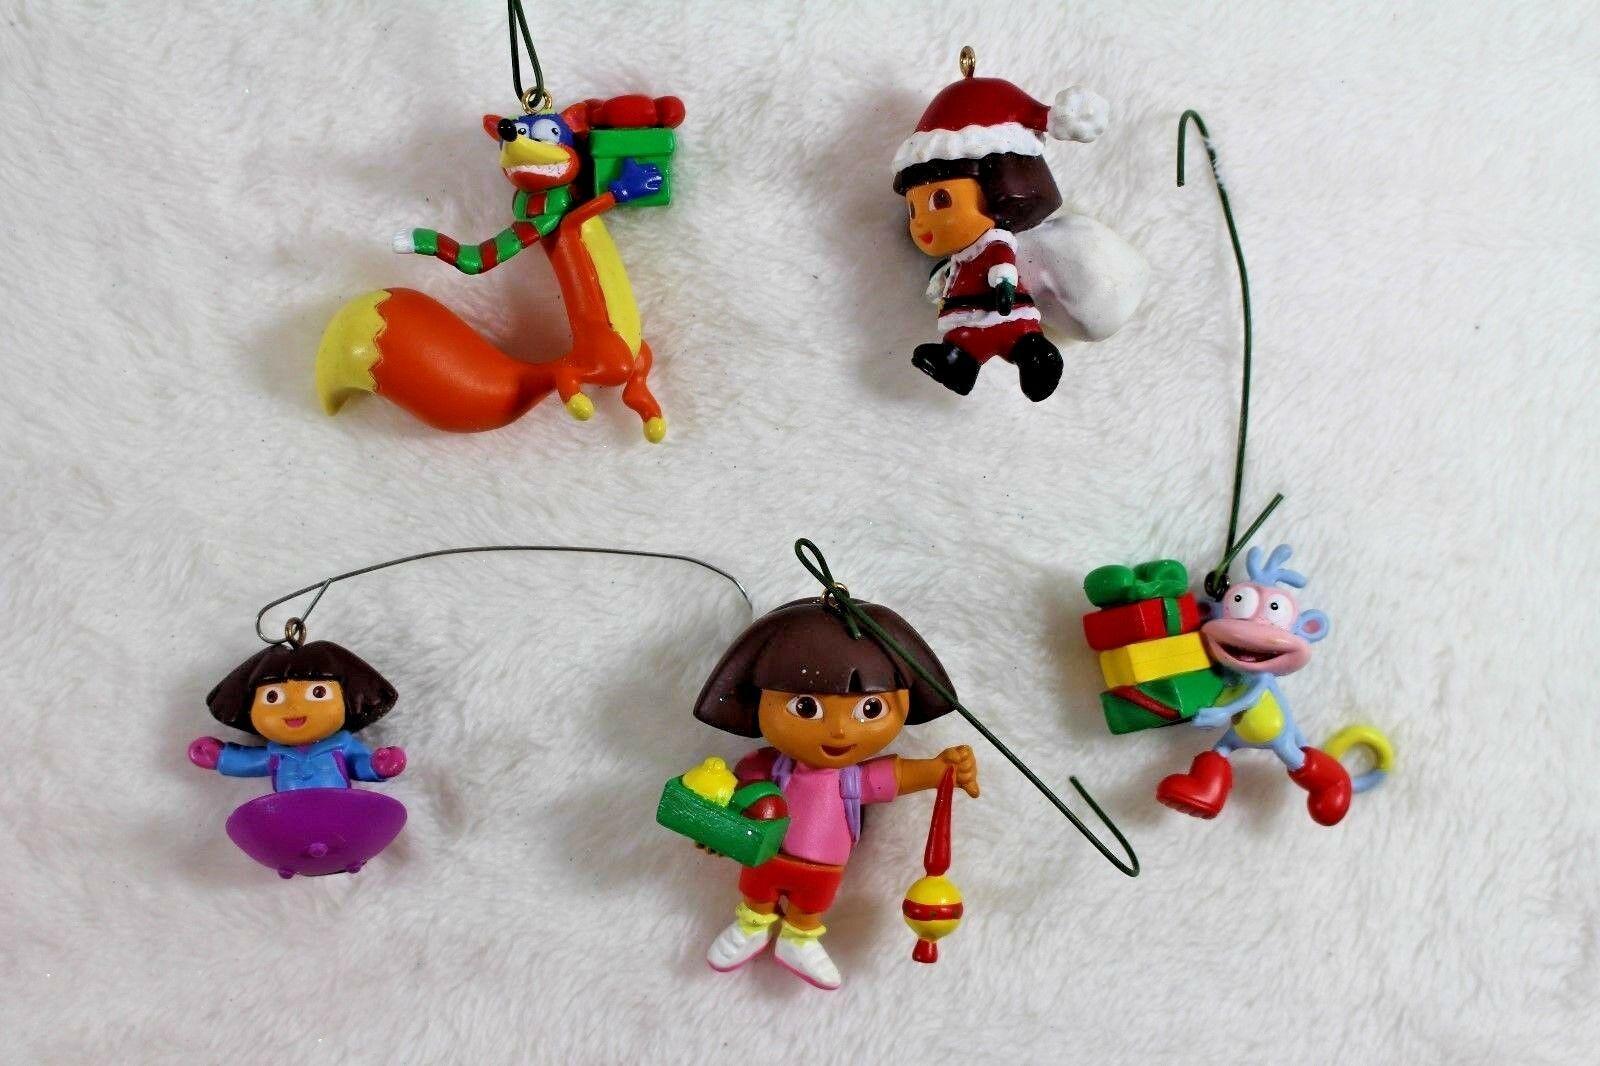 Dora the Explorer Christmas Tree Decorations 5 Mini Ornaments Boots Swiper Dora